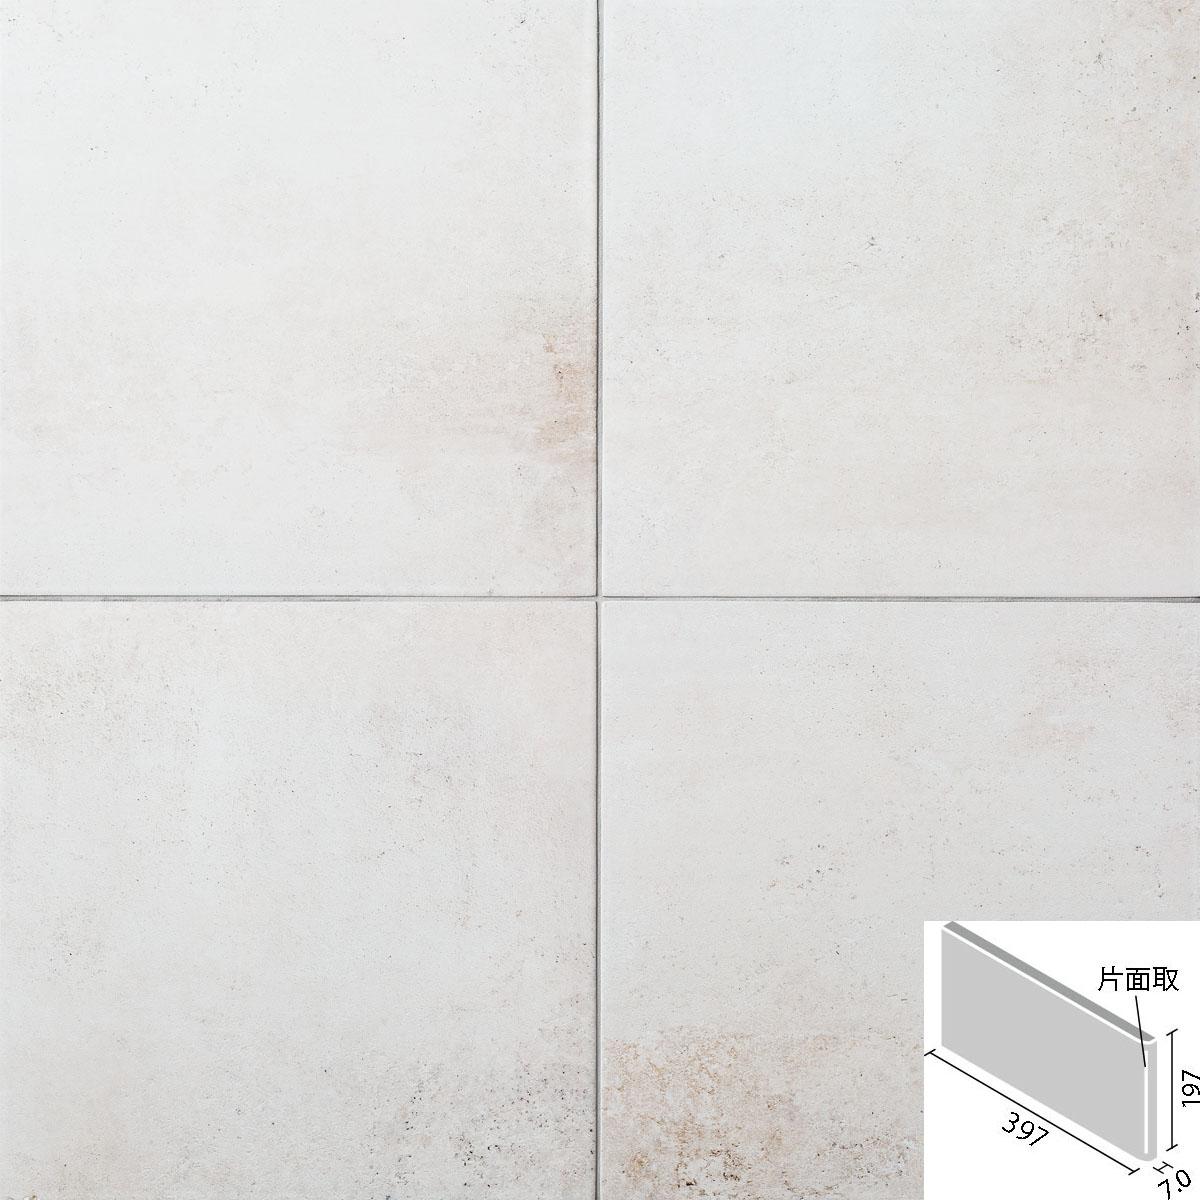 LIXIL(INAX) ビターメタル 400x200mm角片面取(短辺) ID-4260/BMA-1(R)